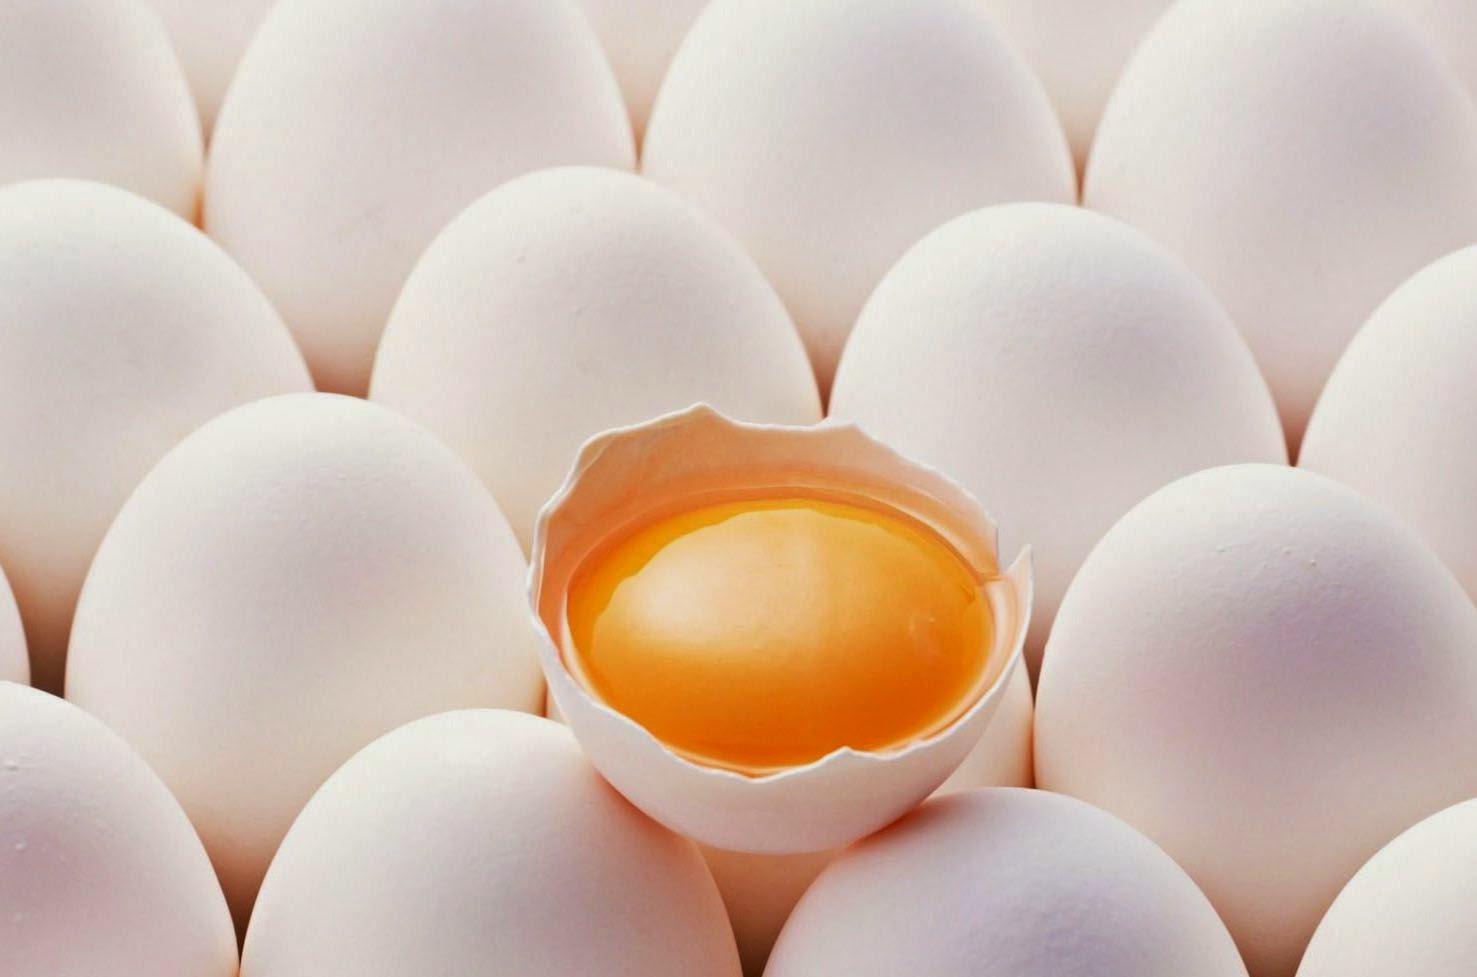 Dapatkan Manfaat dari Telur untuk Kecantikan